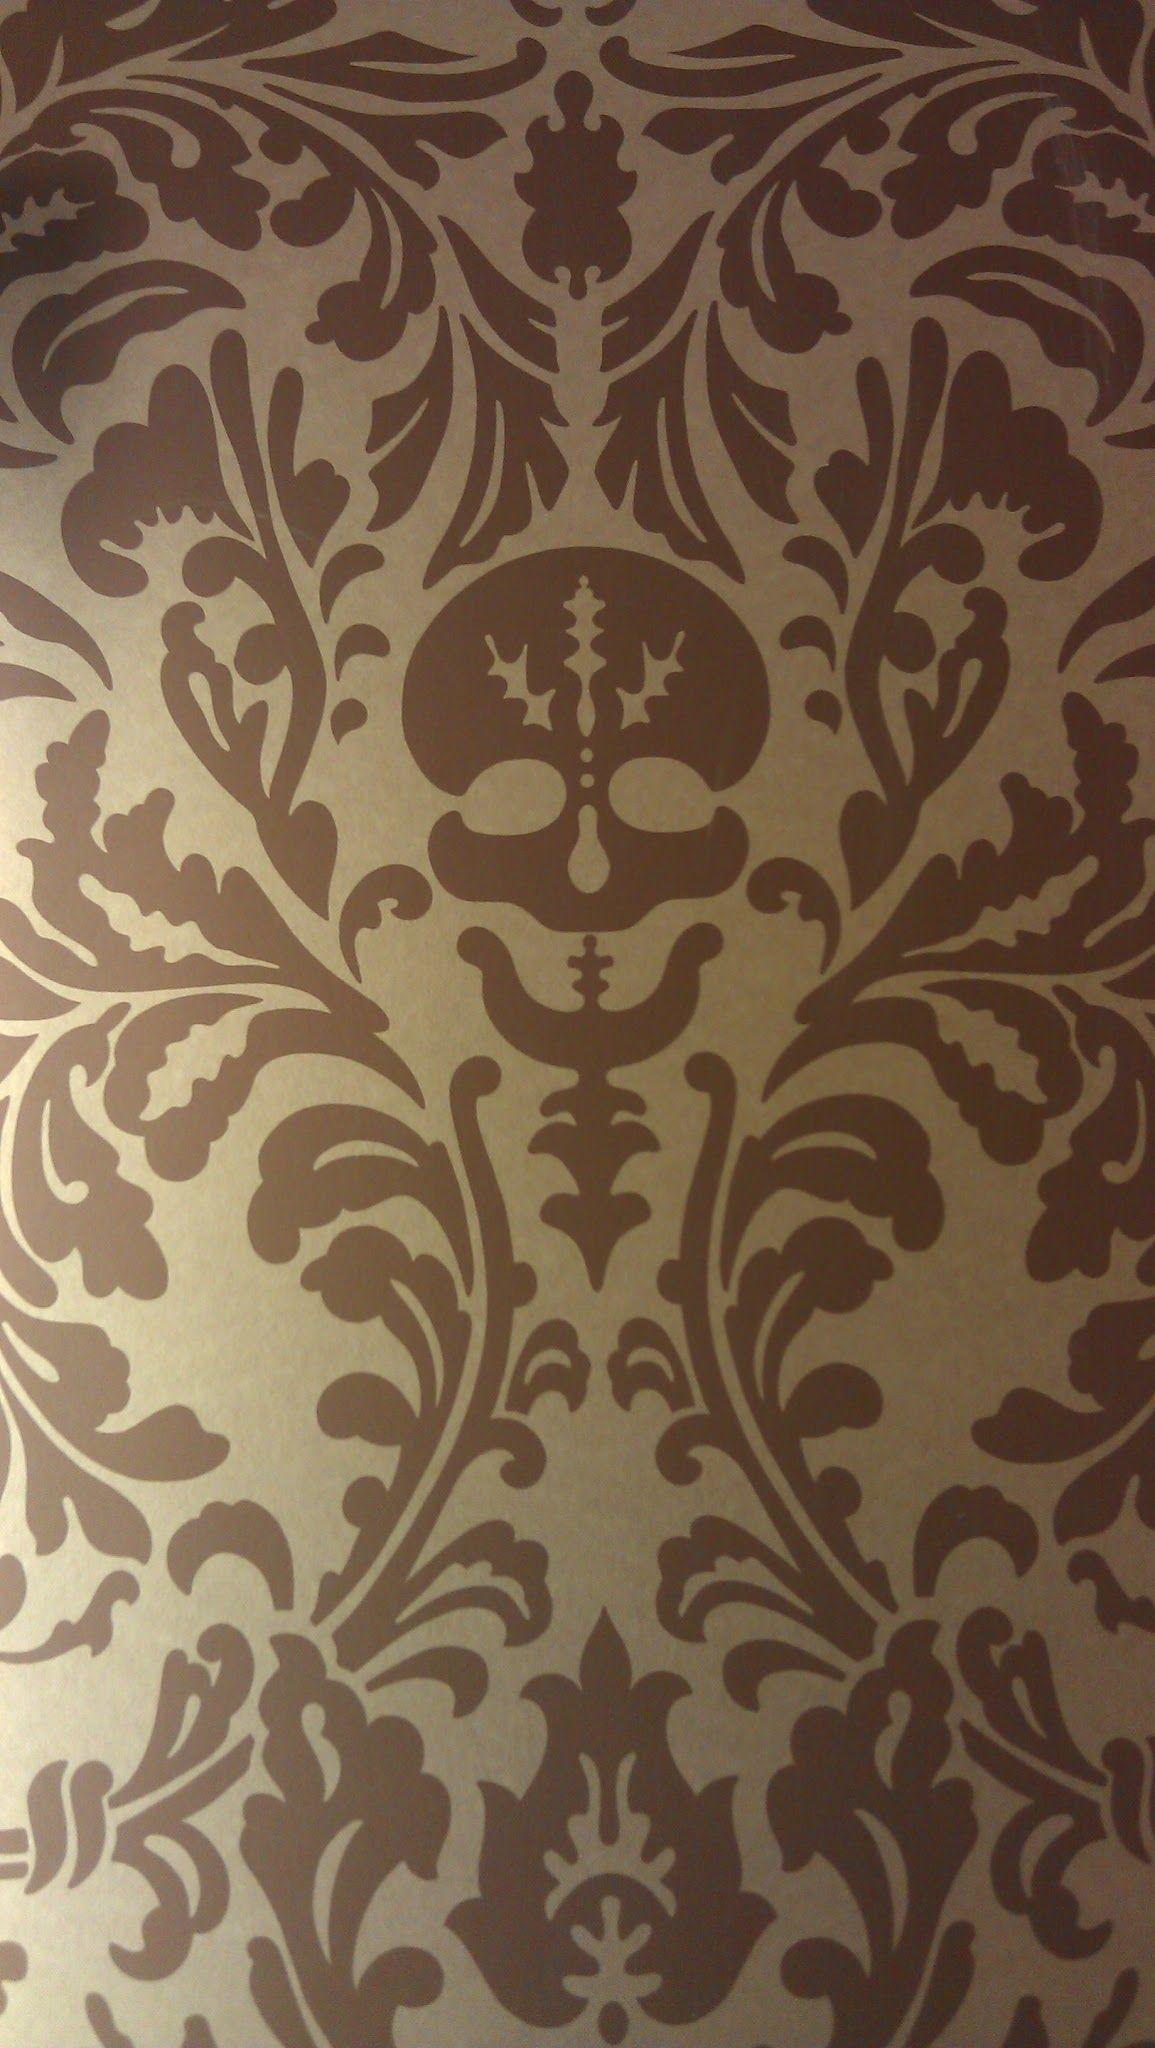 Skull Wallpaper Download Roomhintscom App WALLPAPER HINTS